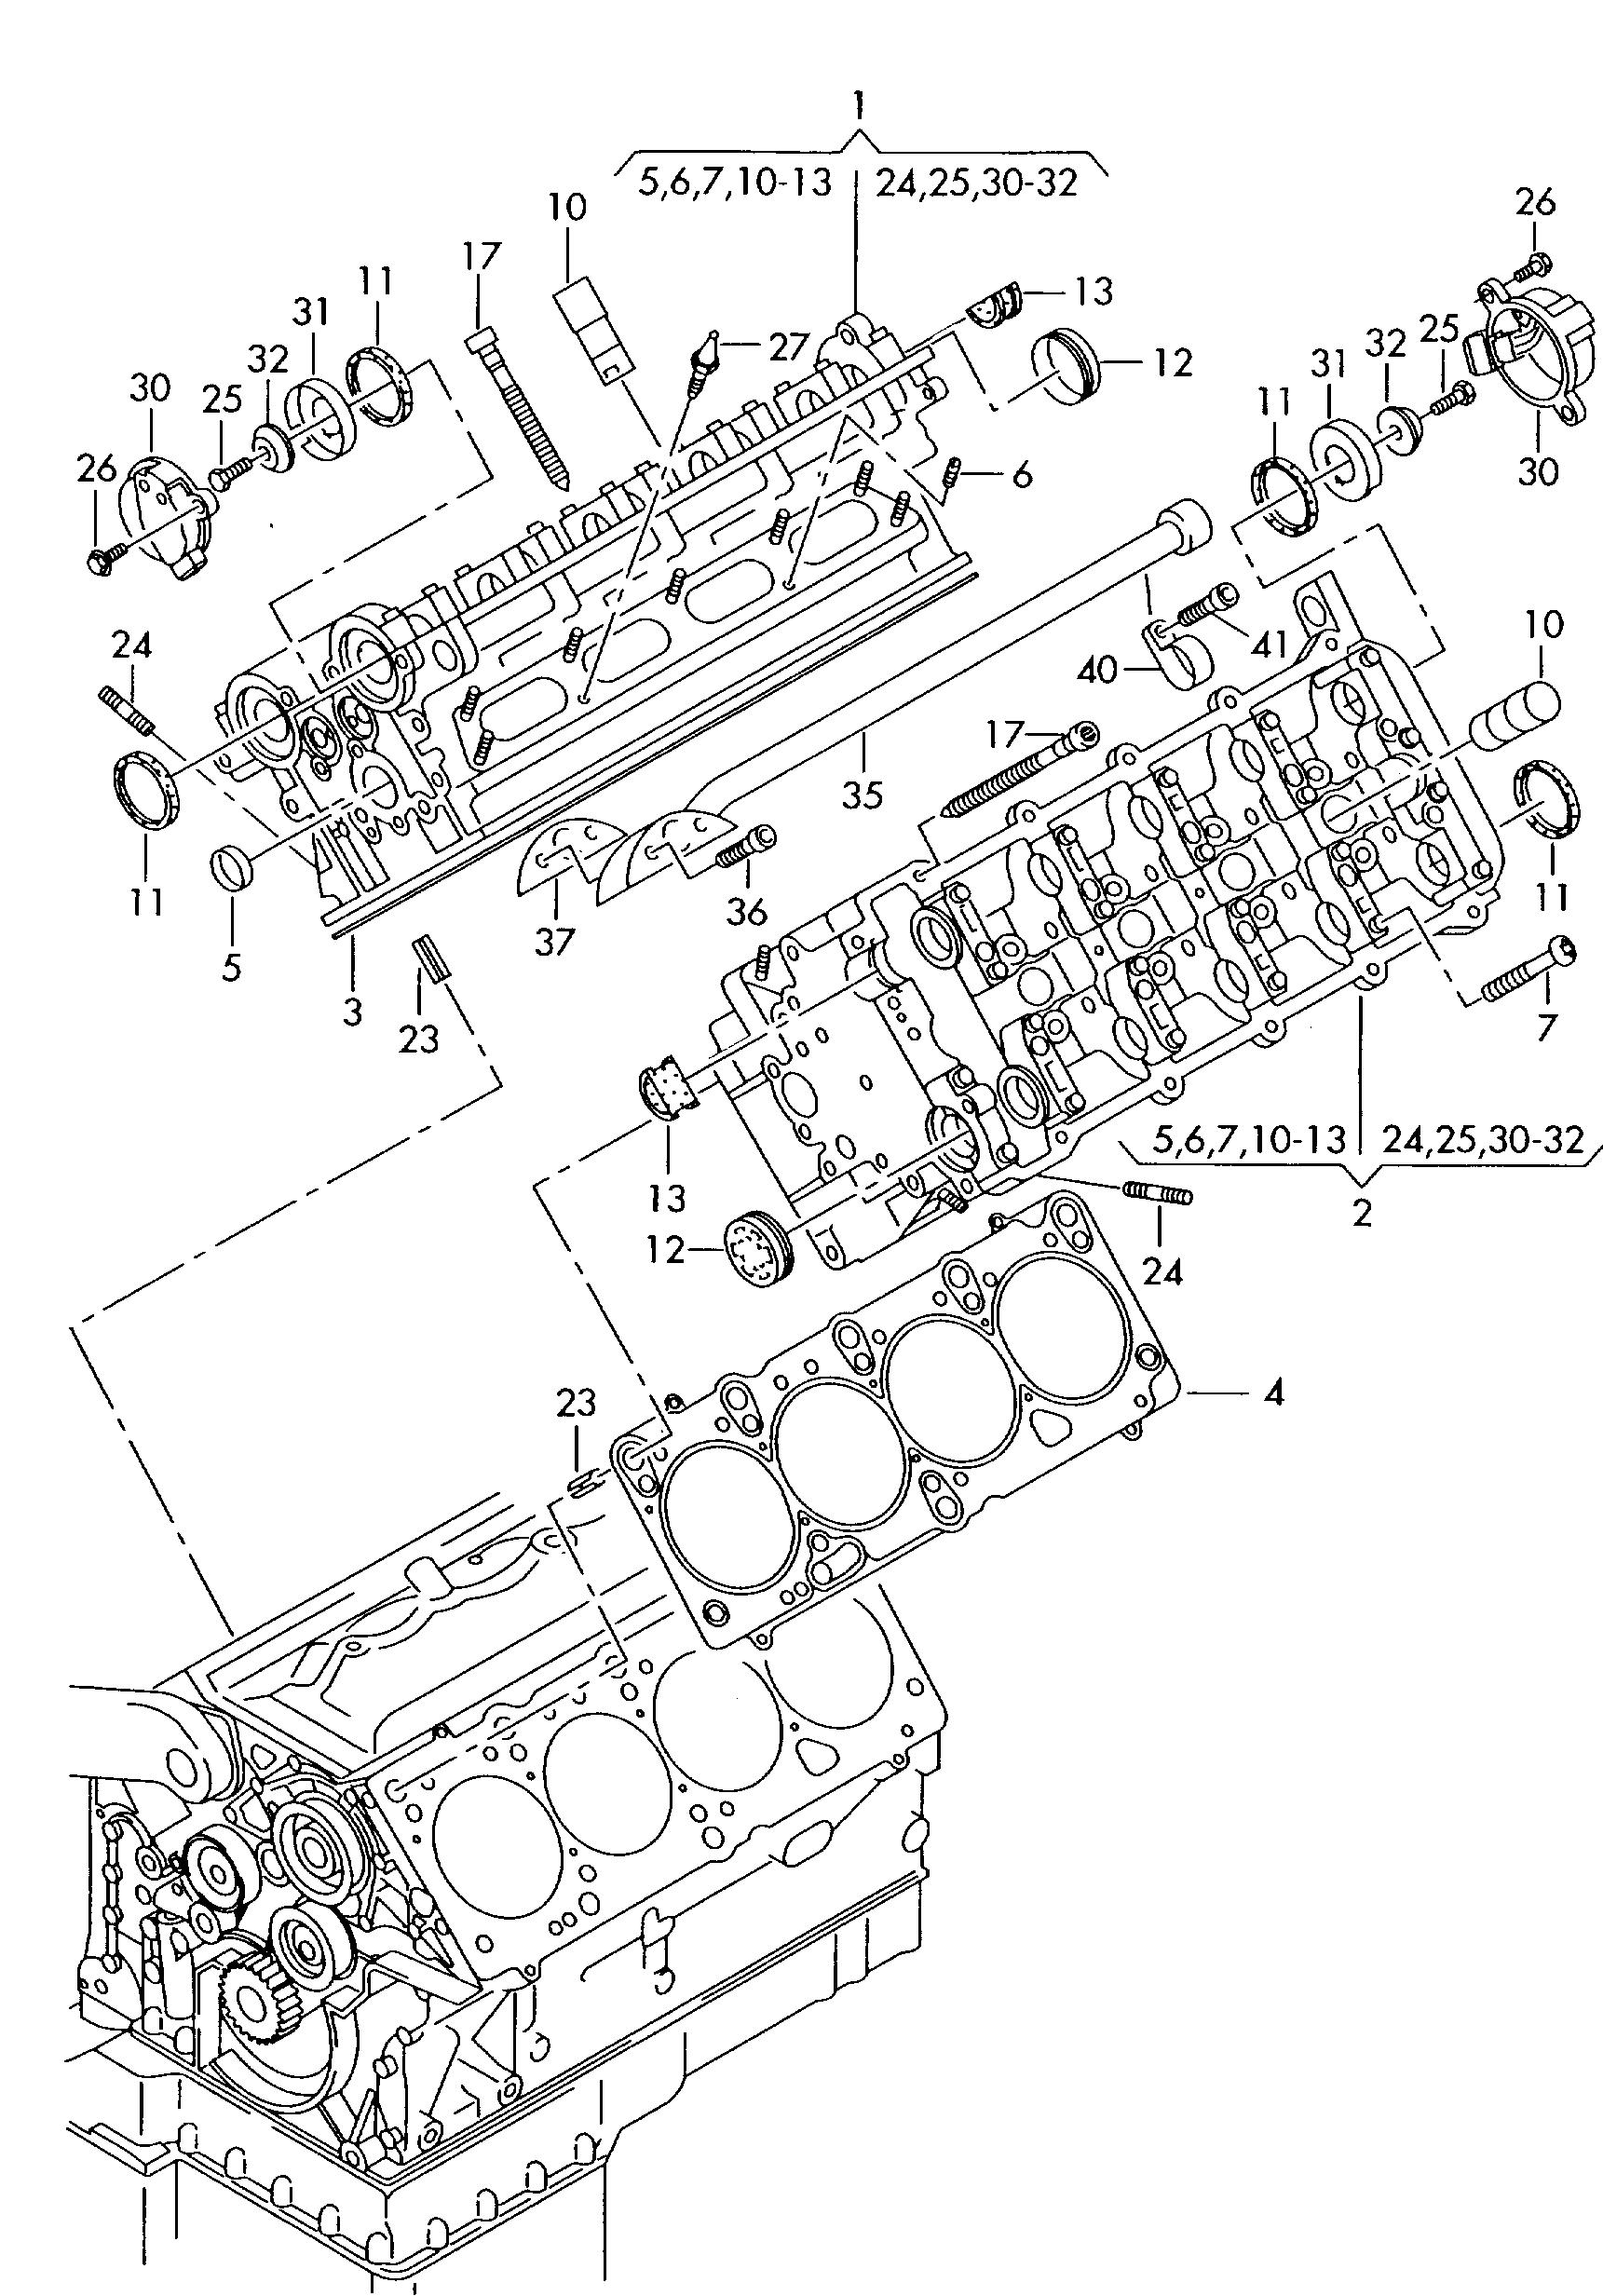 Audi A8 1999 2003 Zylinderkopf Vag Etka Online Nemigacom Engine Diagram